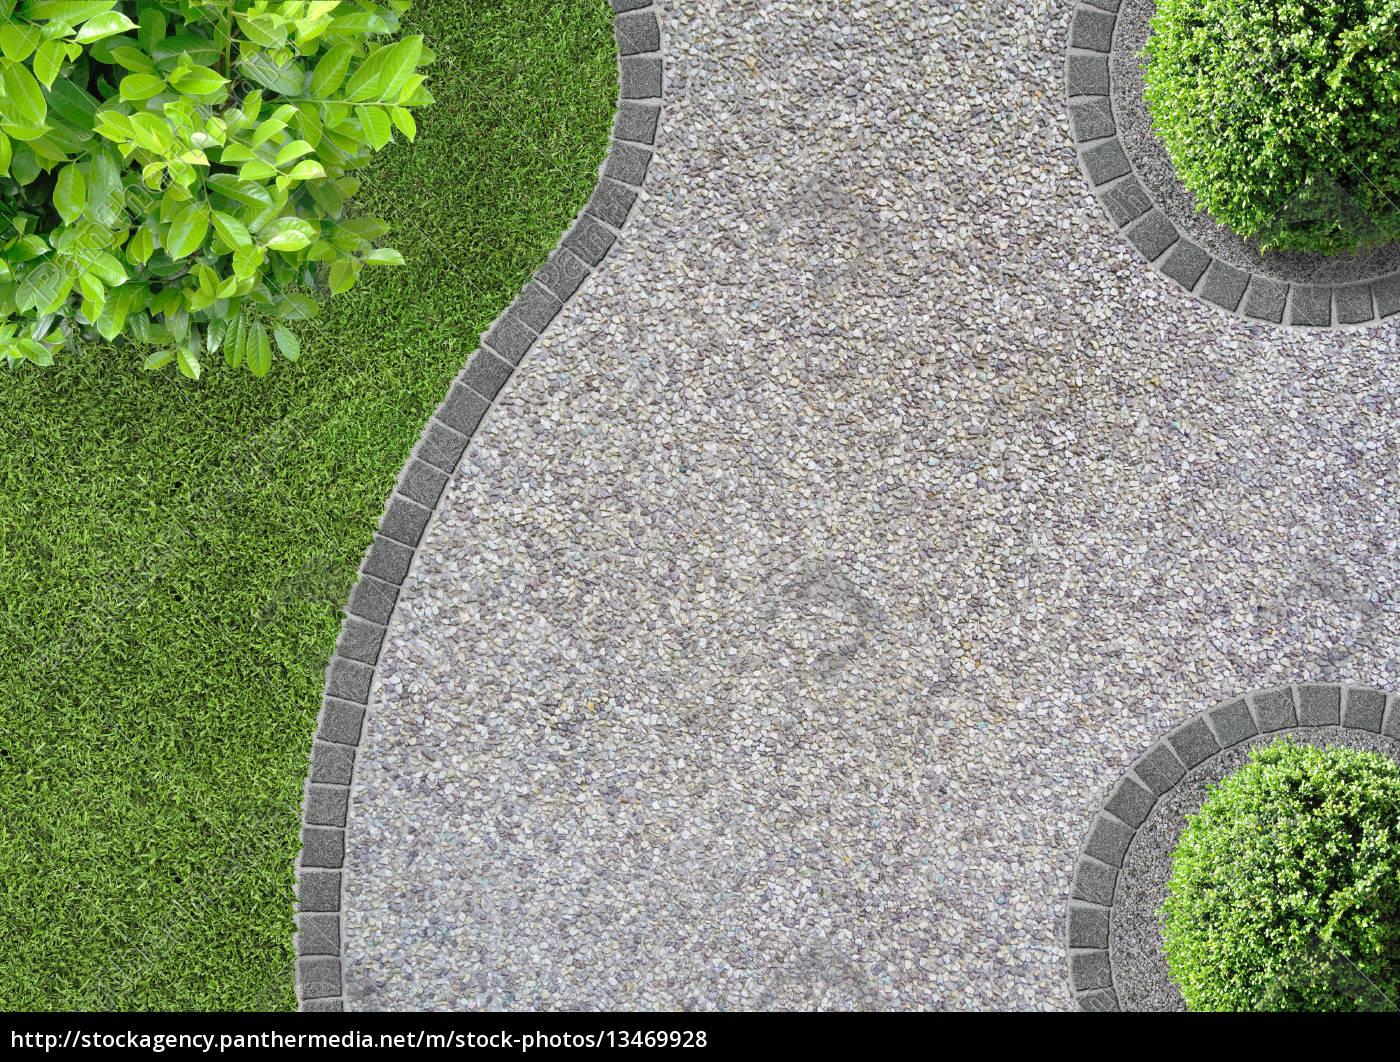 gartenwege anlegen – ideen für den kiesweg im garten – motelindio, Gartenarbeit ideen